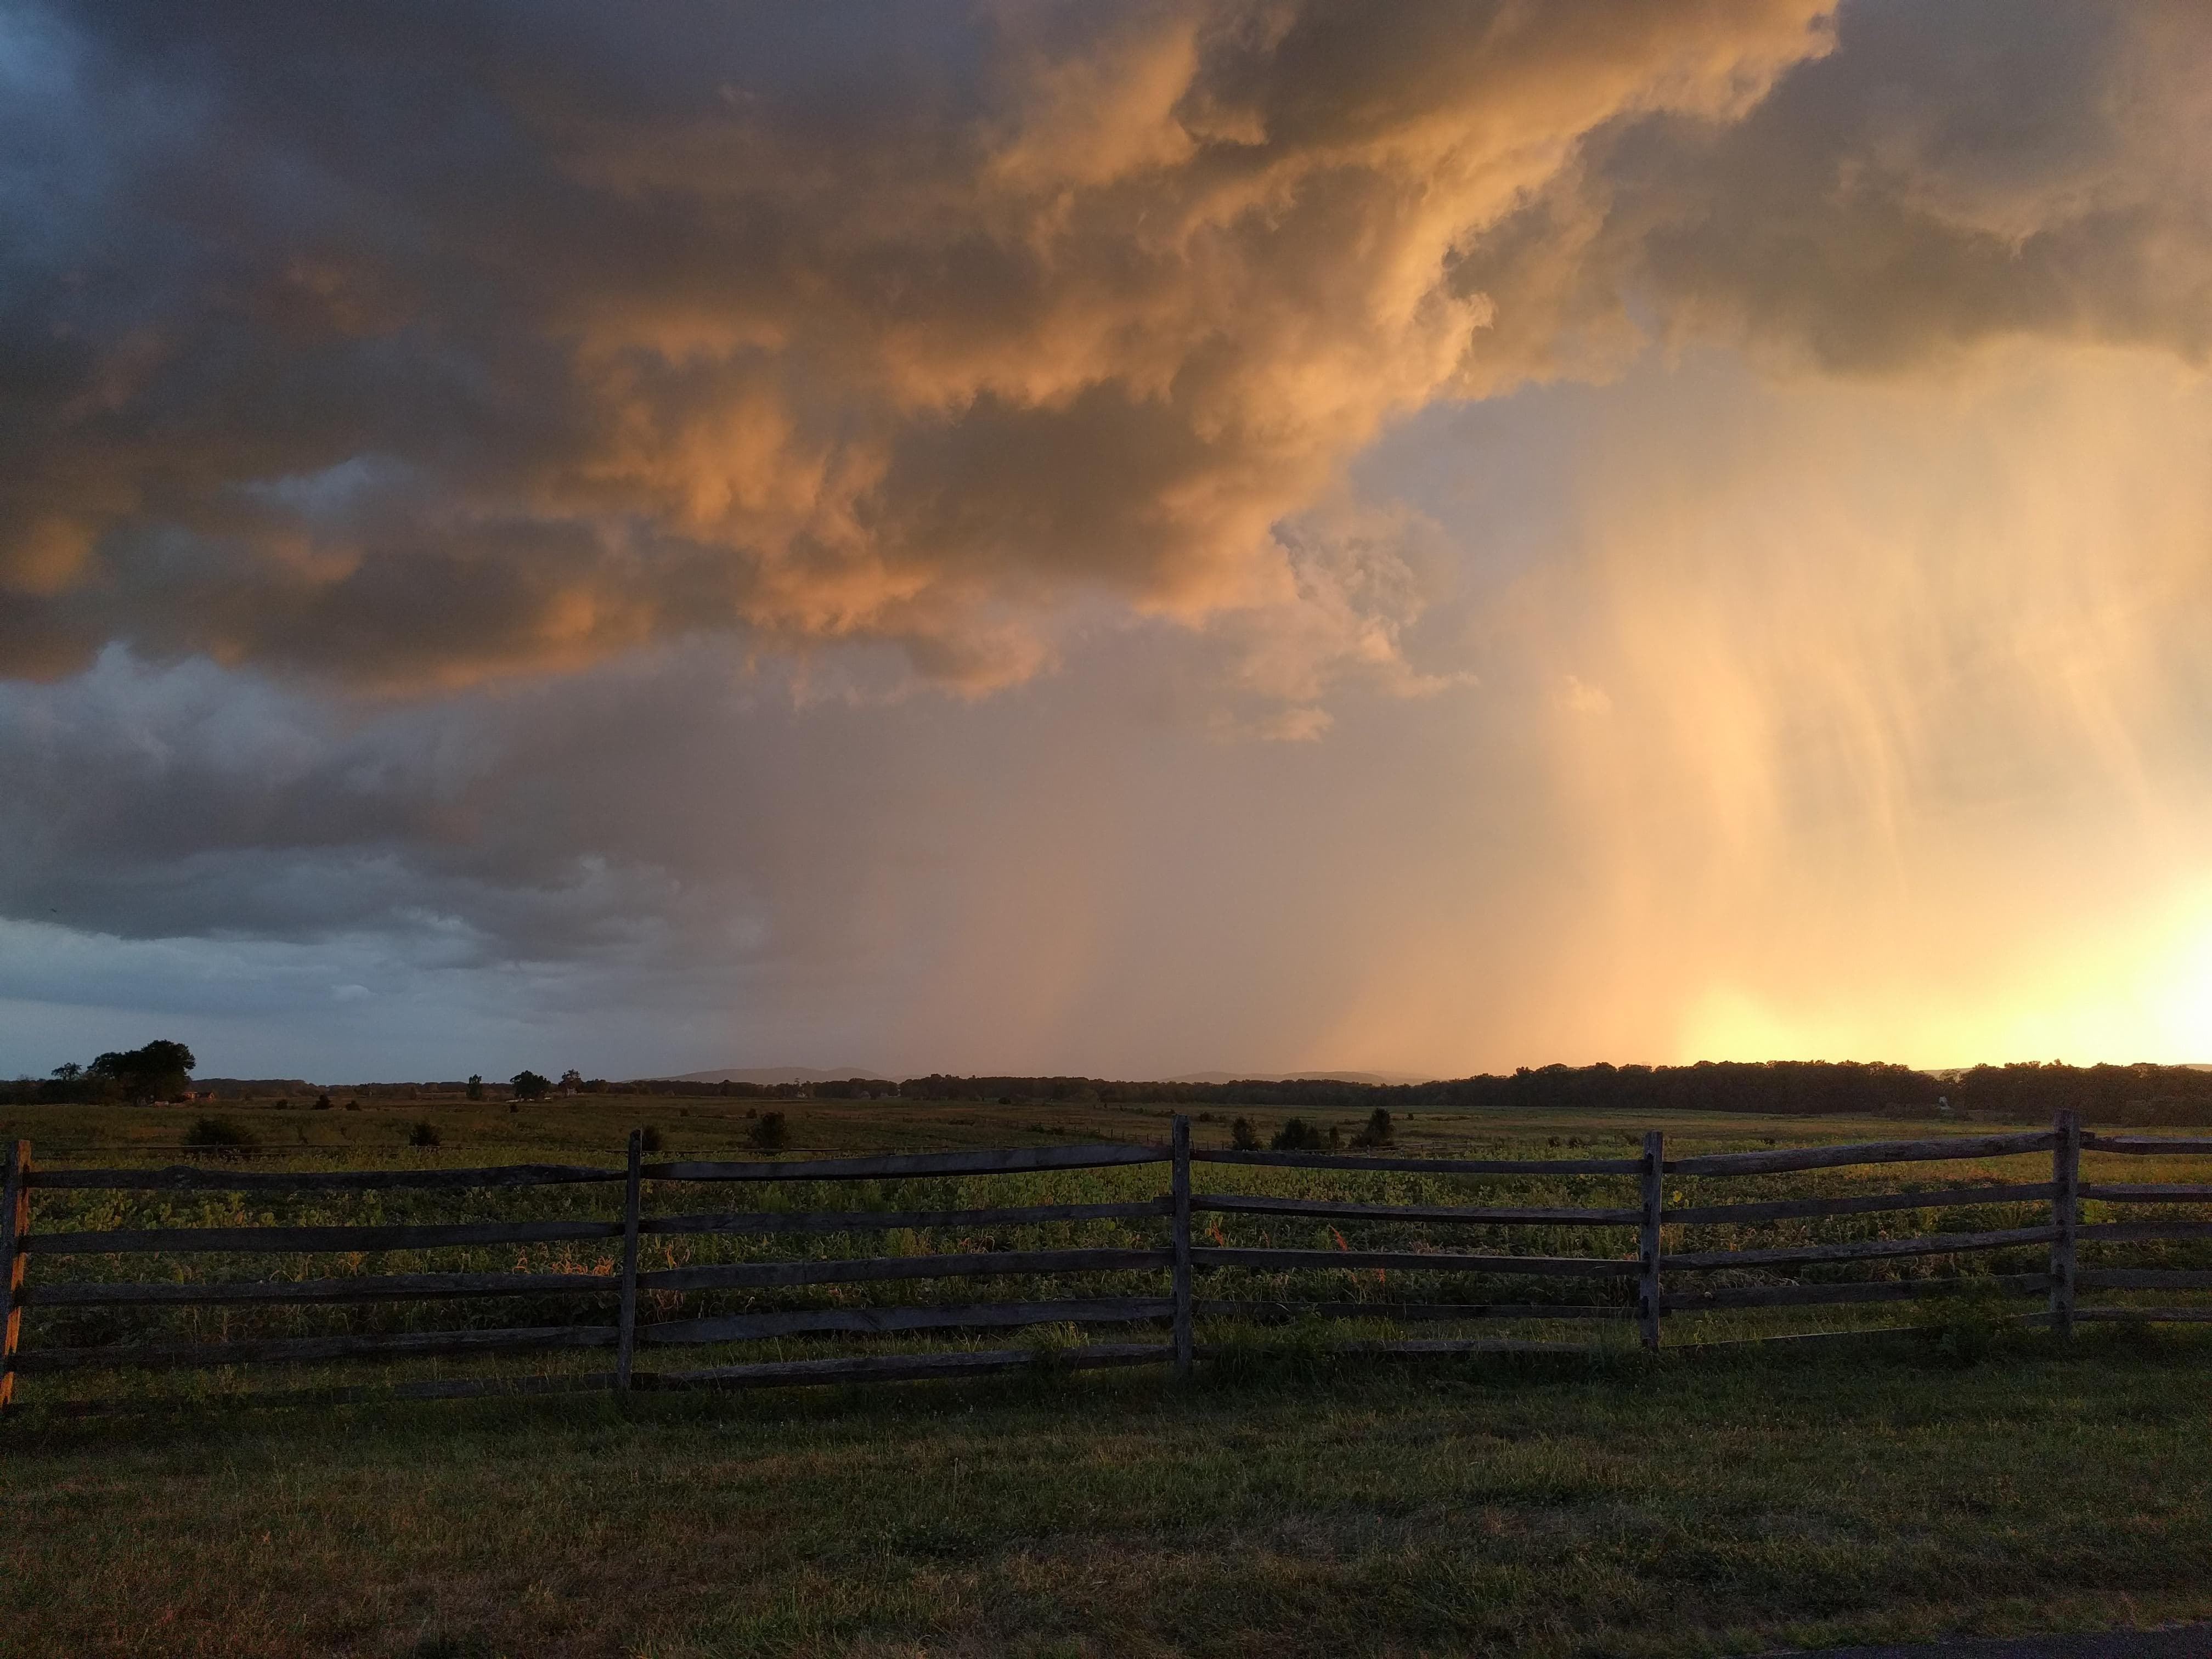 Sunset in Gettysburg PA